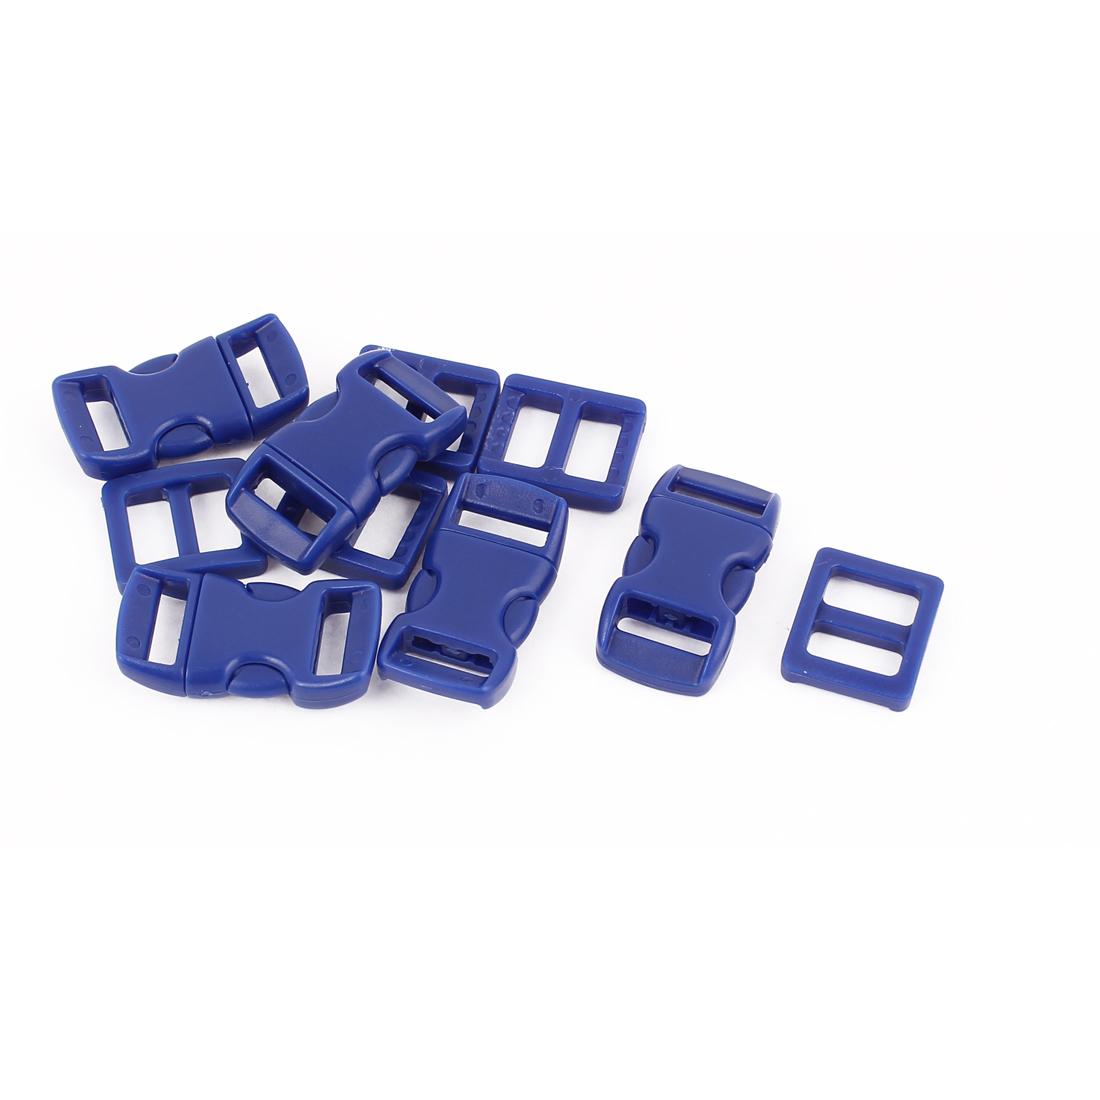 5pcs Dark Blue Plastic Packbag Side Quick Release Clasp Buckles for 10-11mm Webbing Strap